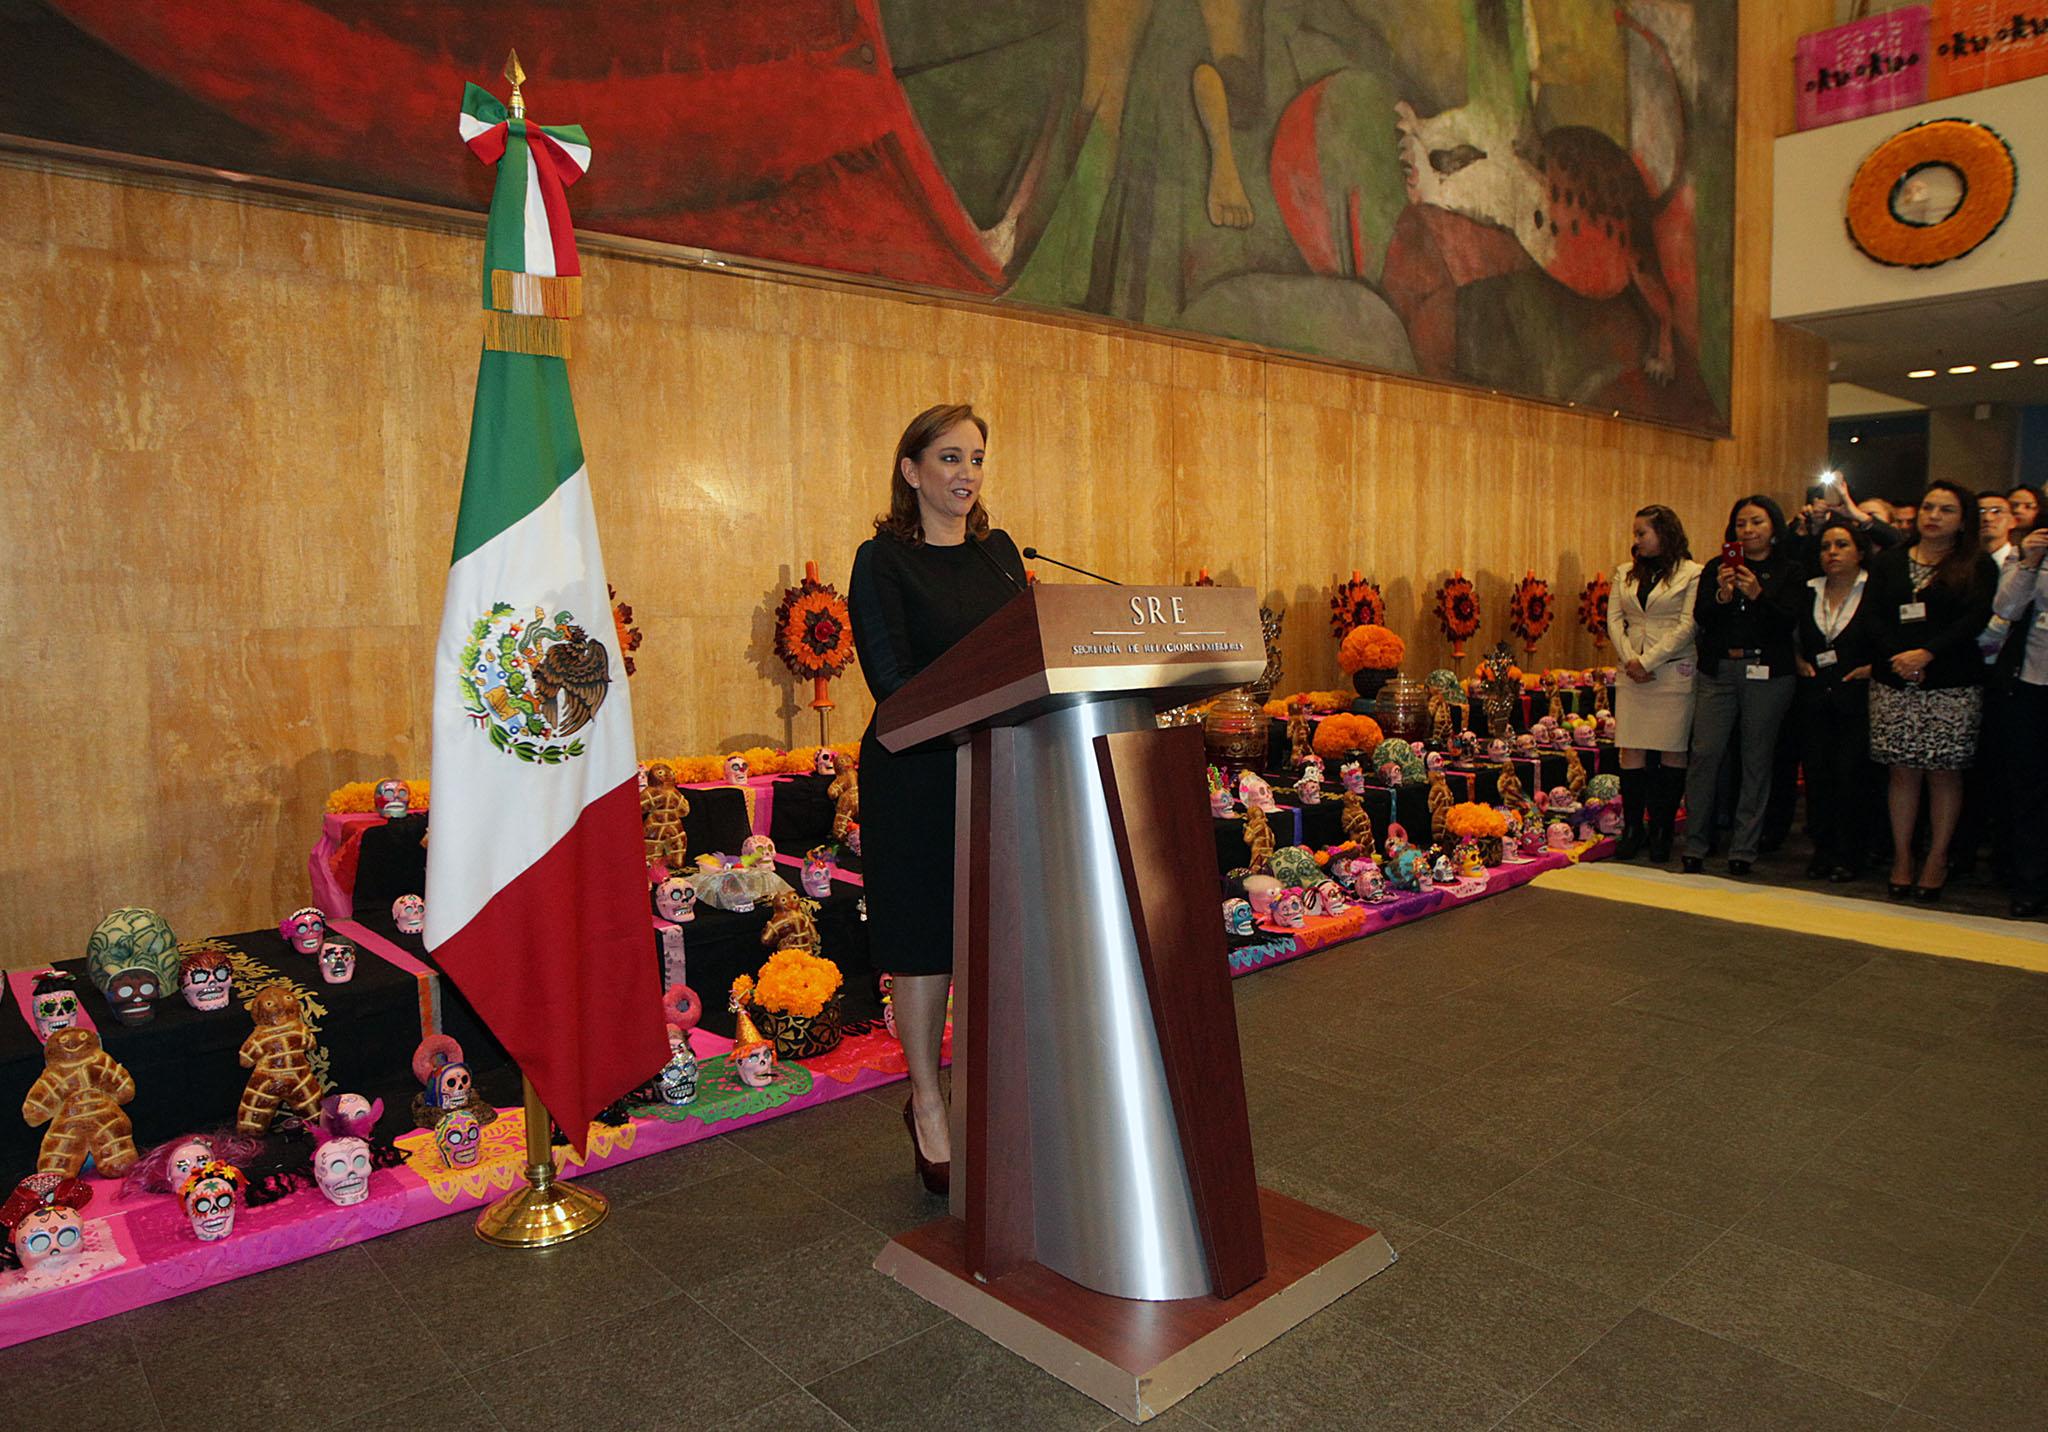 FOTO 1 Canciller Claudia Ruiz Massieu inaugur  la ofrenda por el D a de Muertos en la SRE.jpg